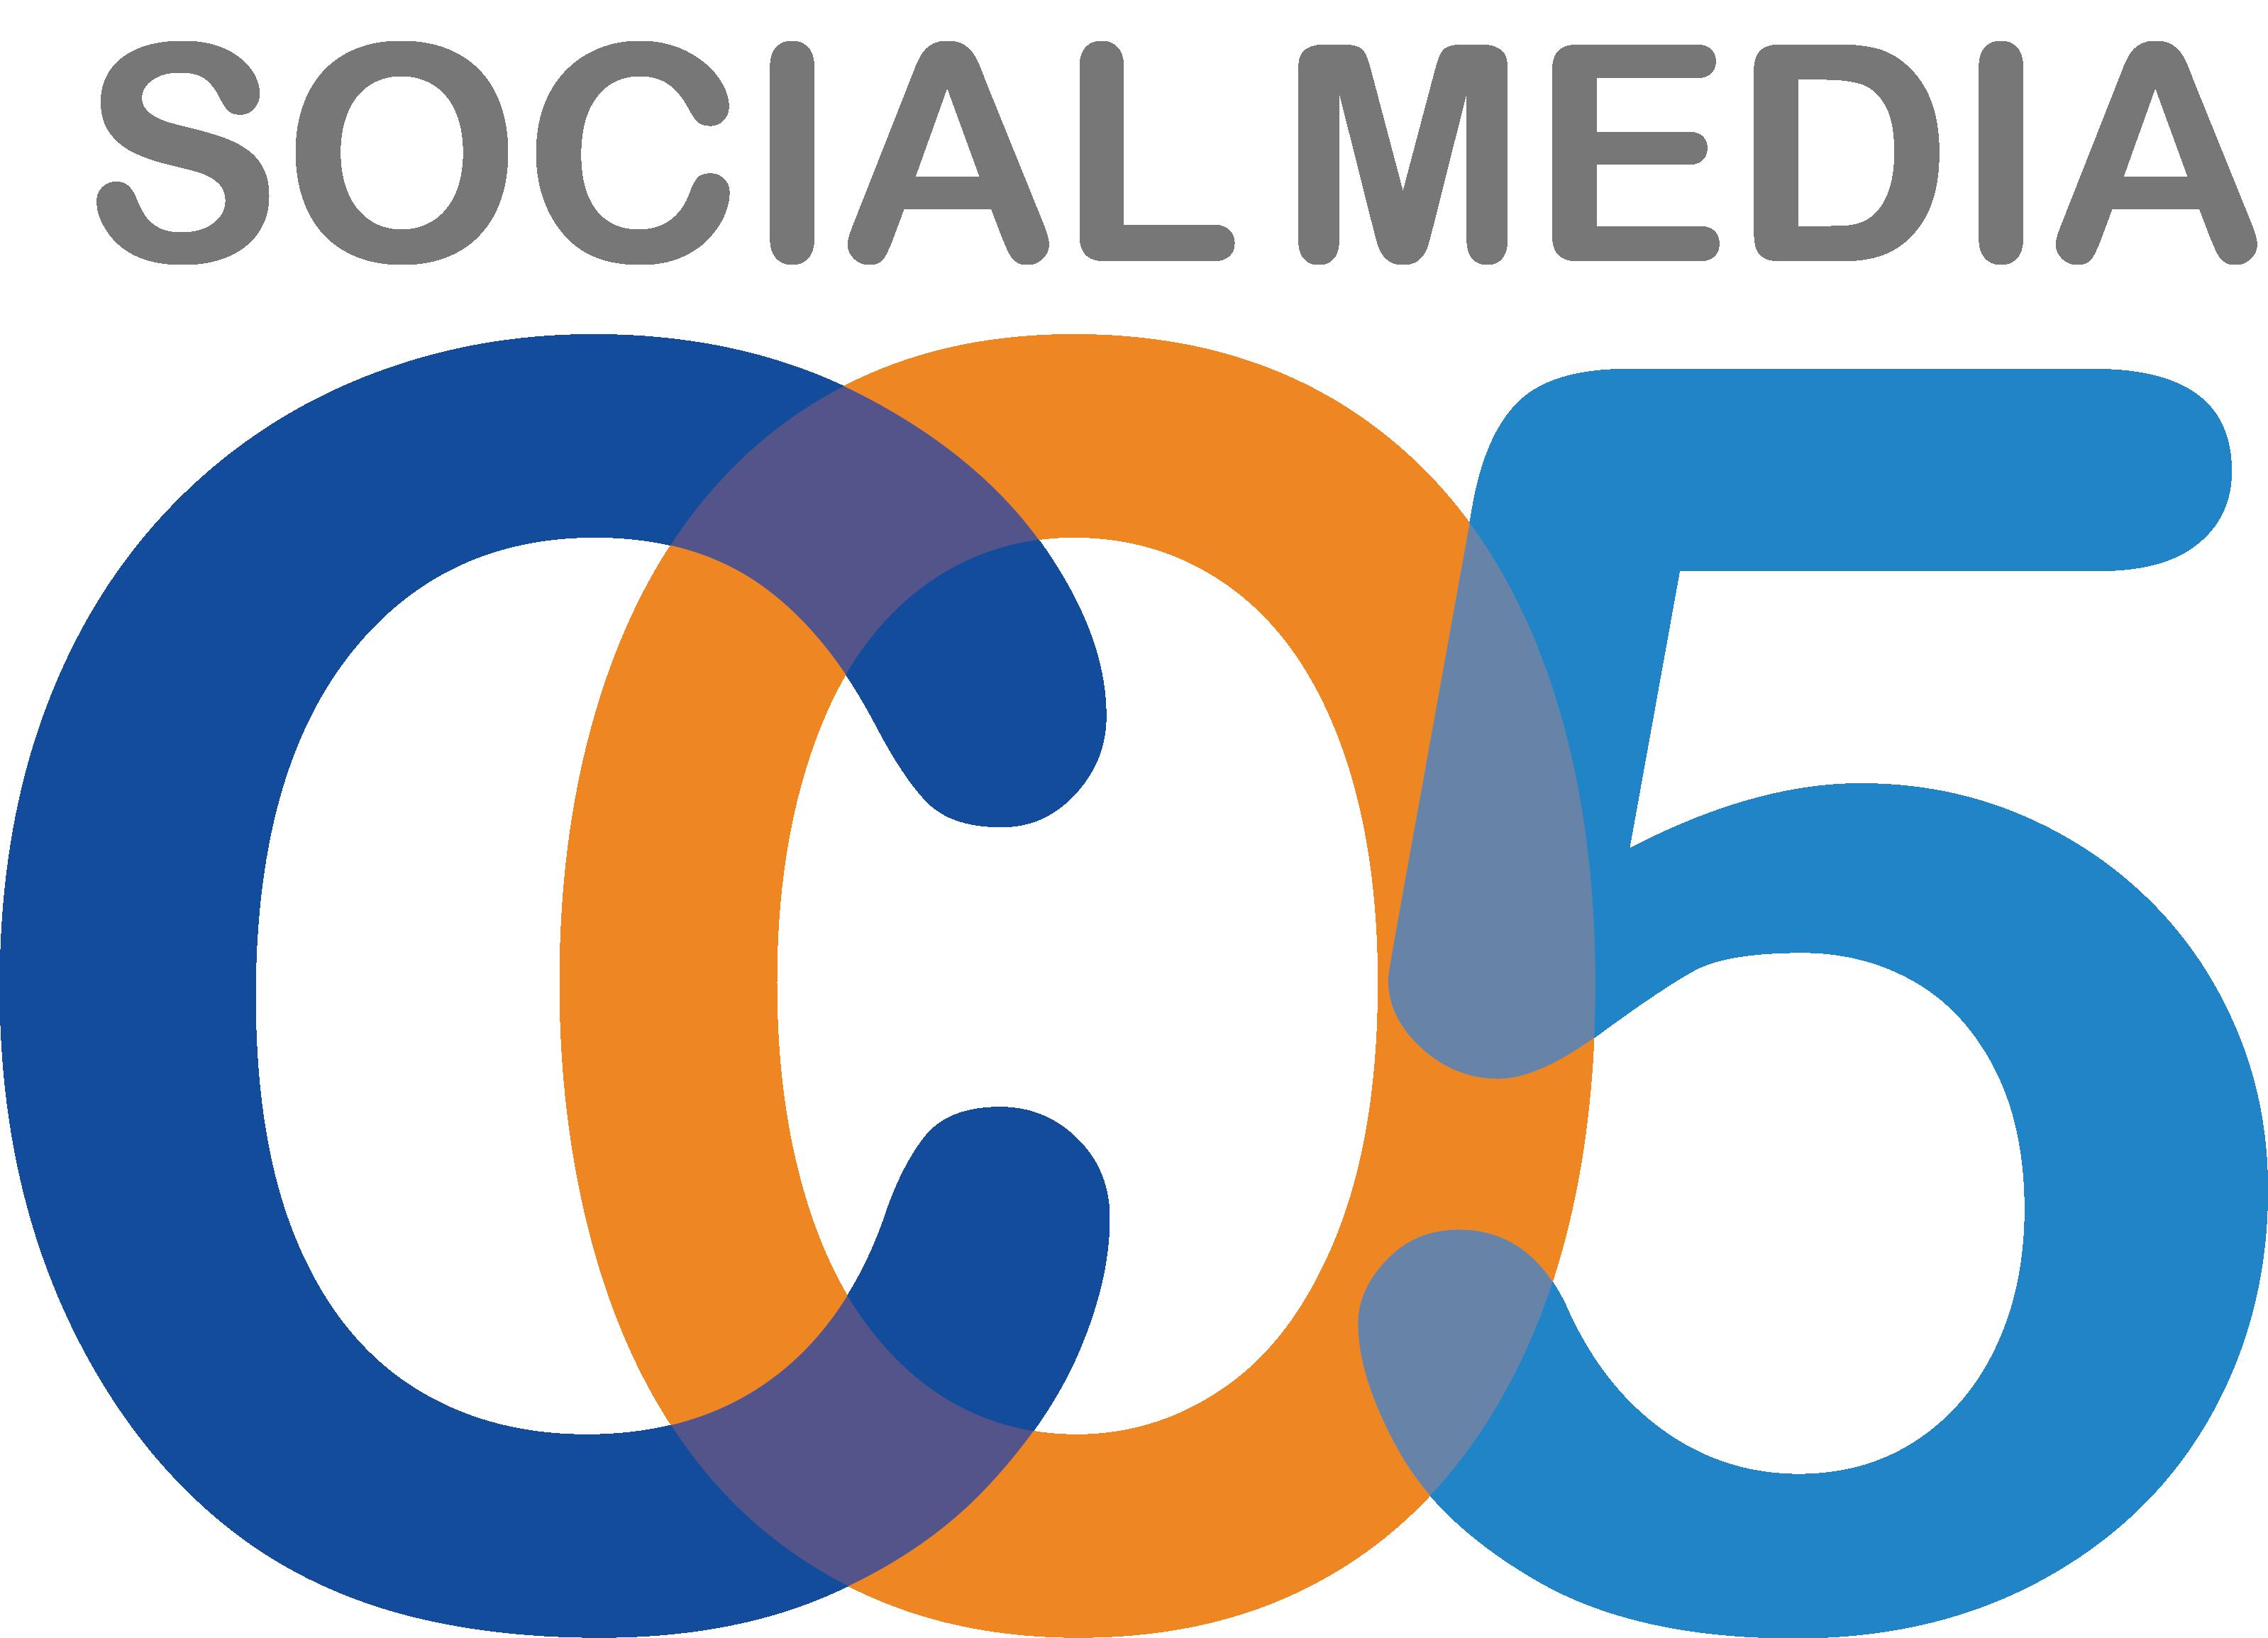 SOCIAL MEDIA CO5